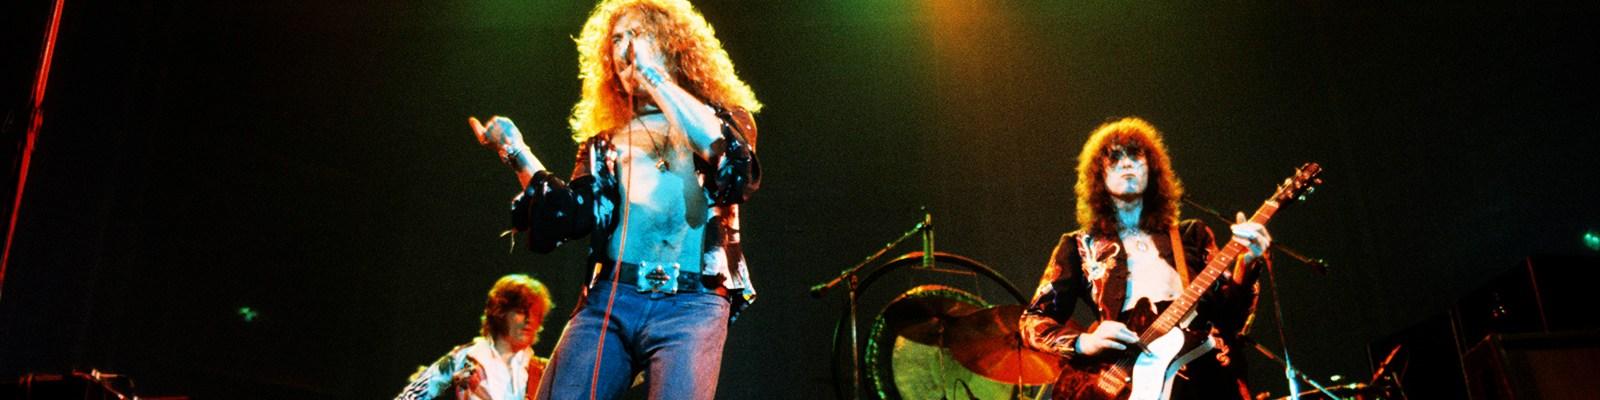 The Best Led Zeppelin Songs, Ranked